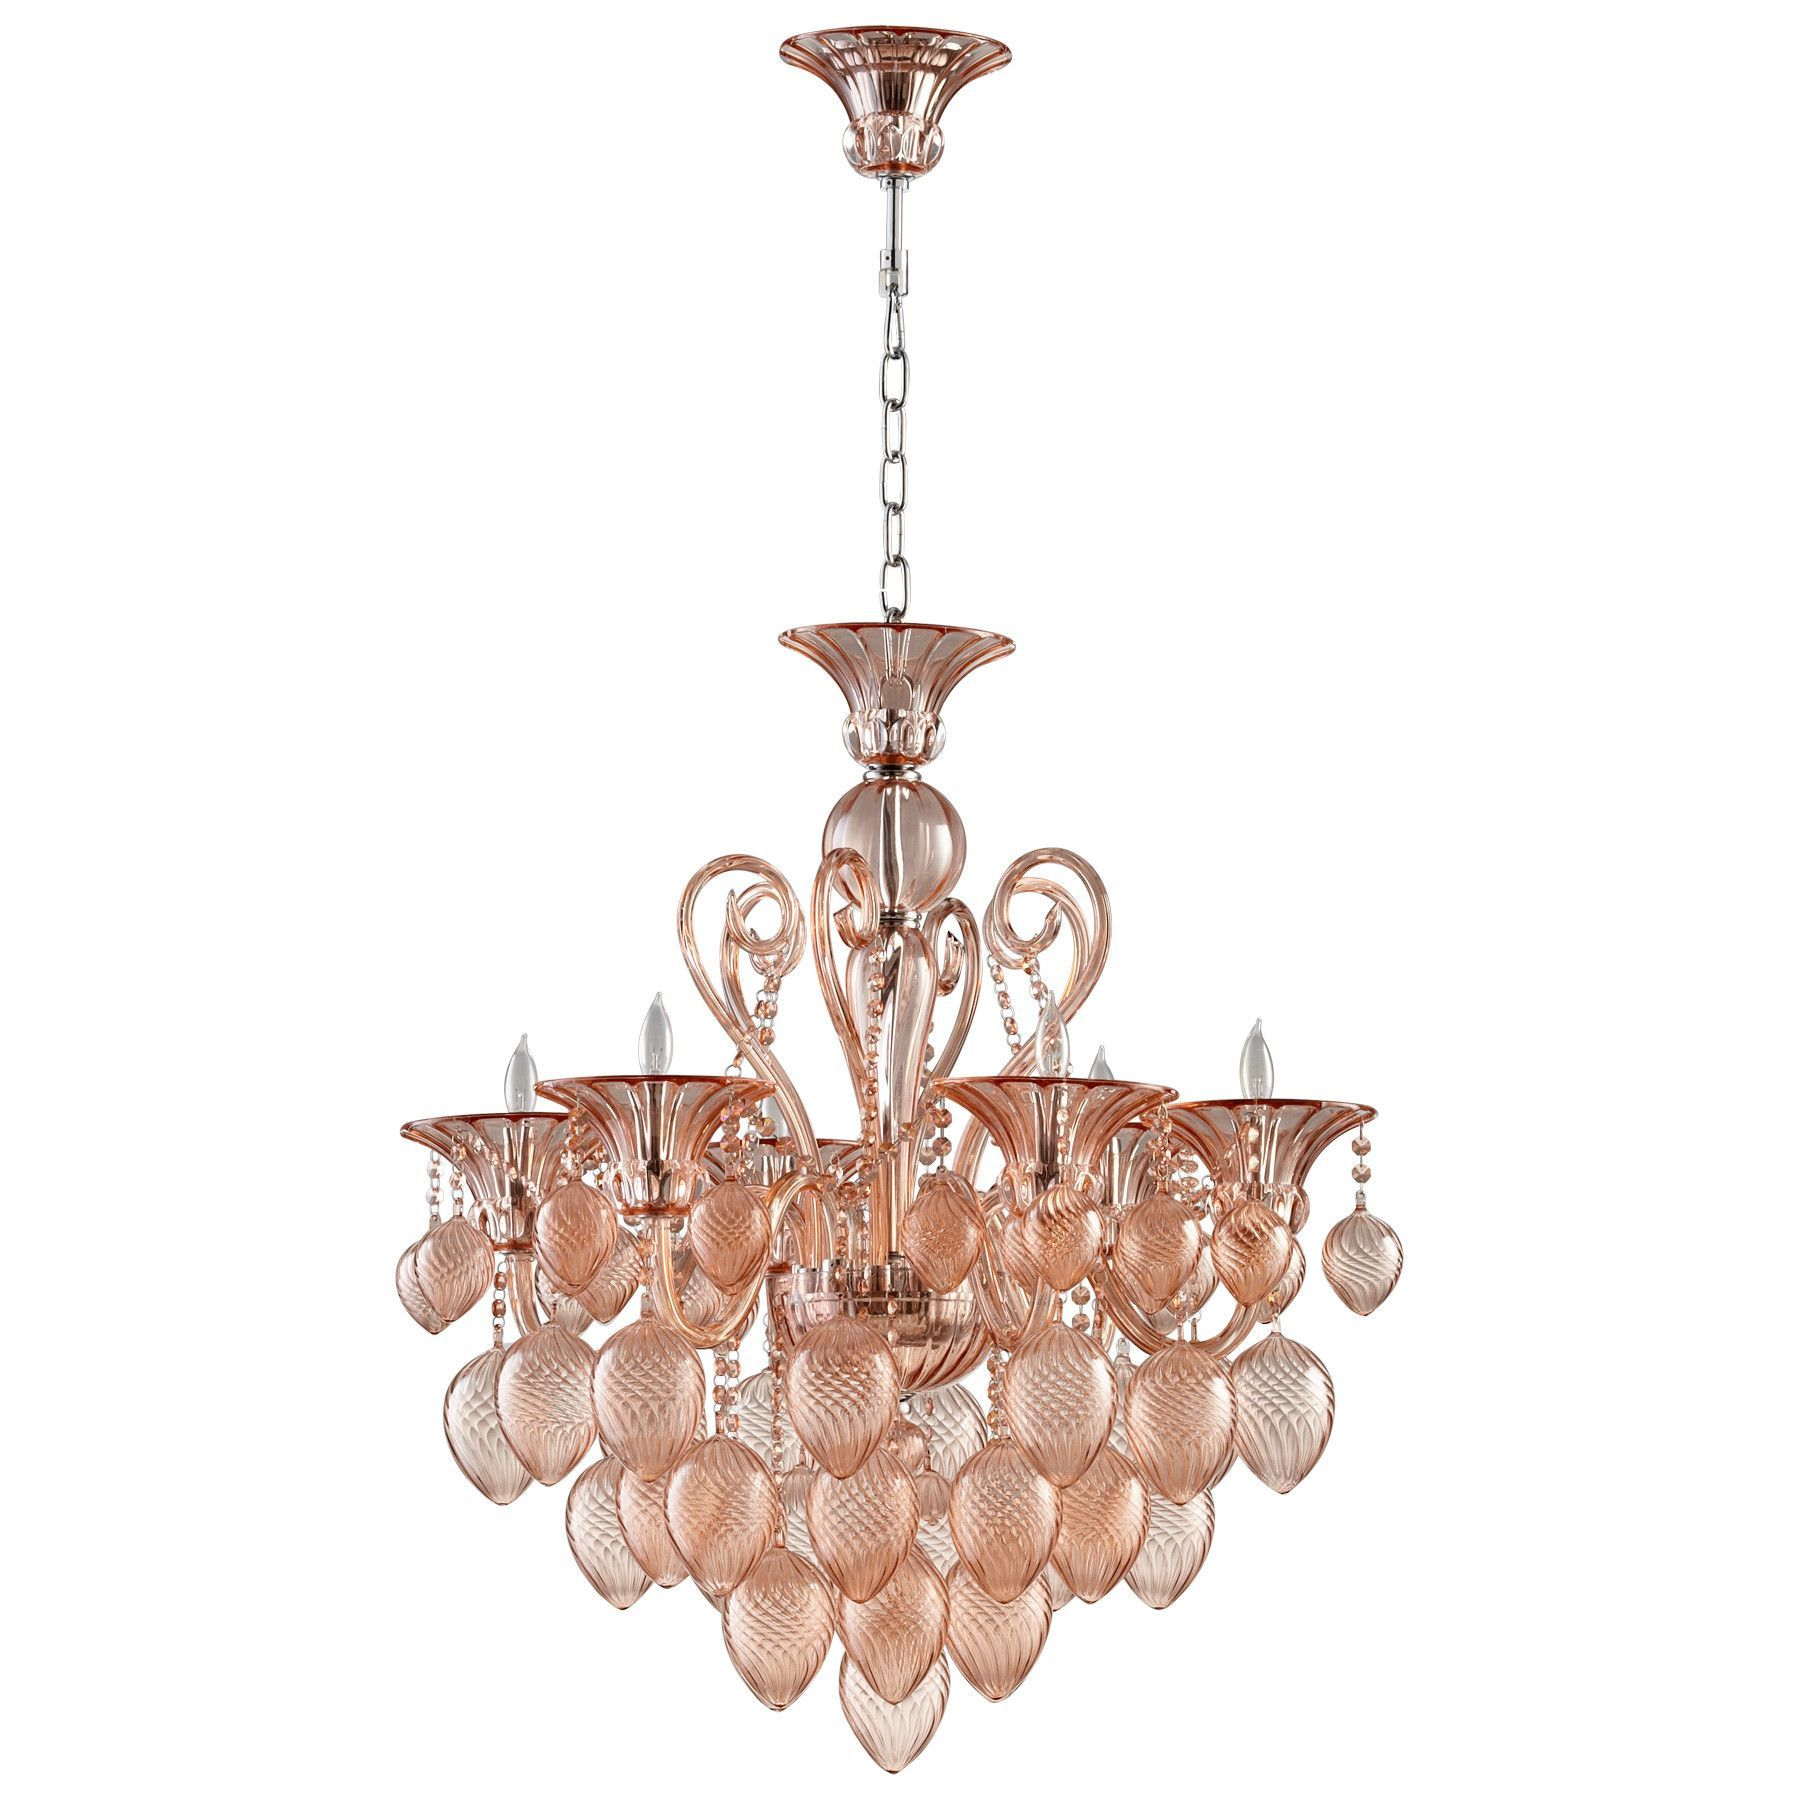 Small bella vetro chandelier hanging lights chandeliers light small bella vetro chandelier arubaitofo Images